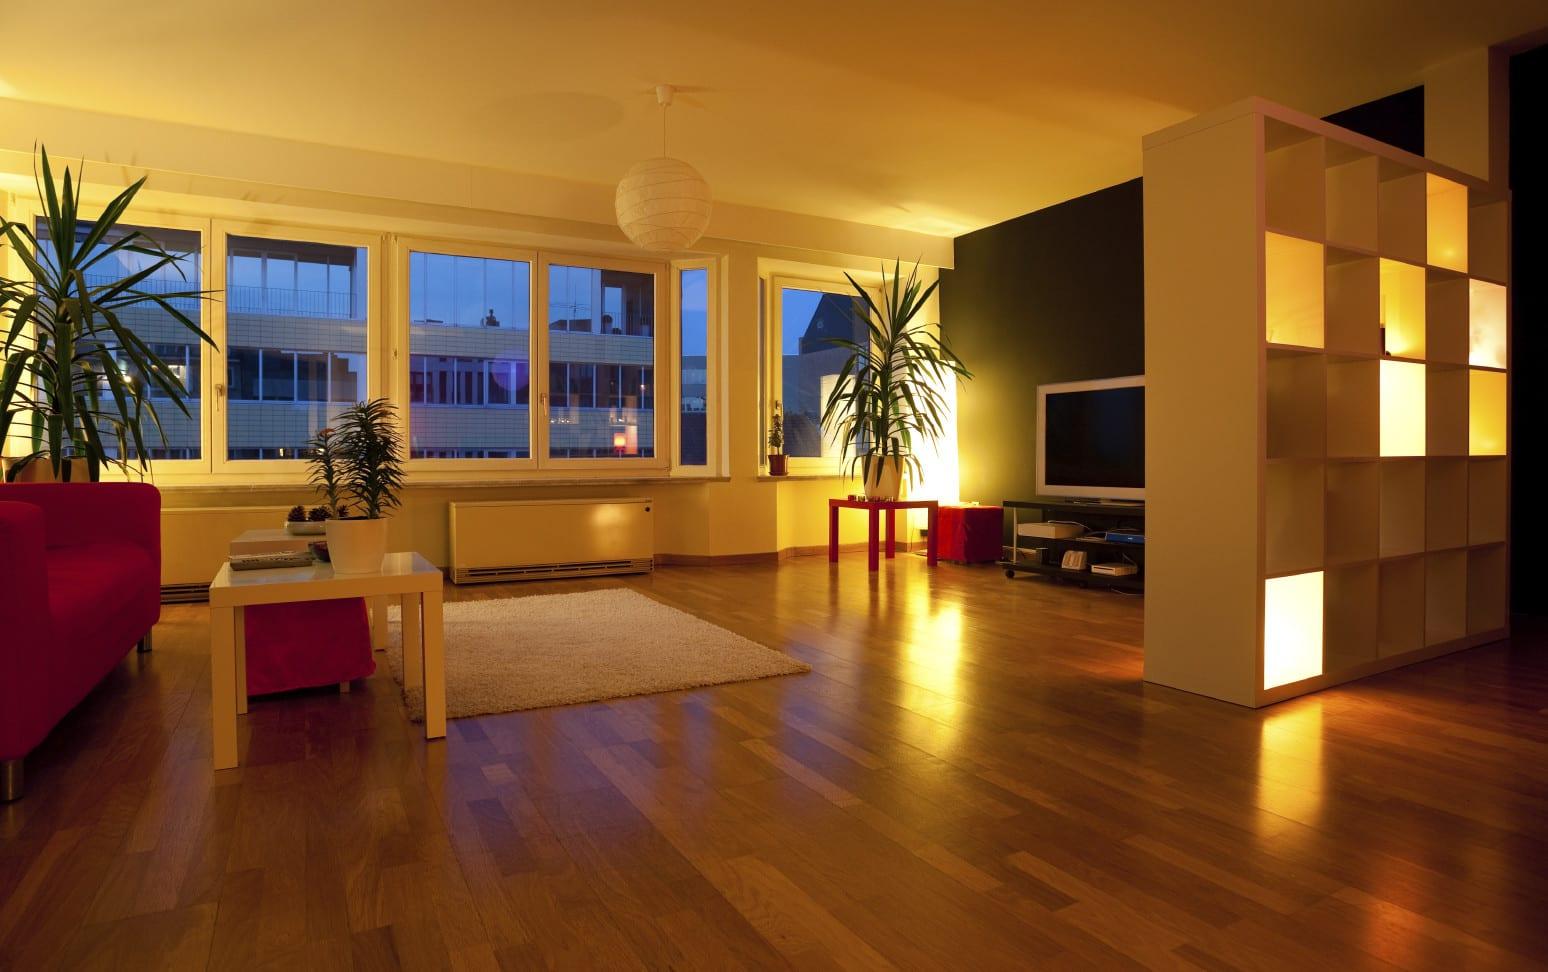 Decke Wohnzimmer Beleuchtung Ideen – Caseconrad.com